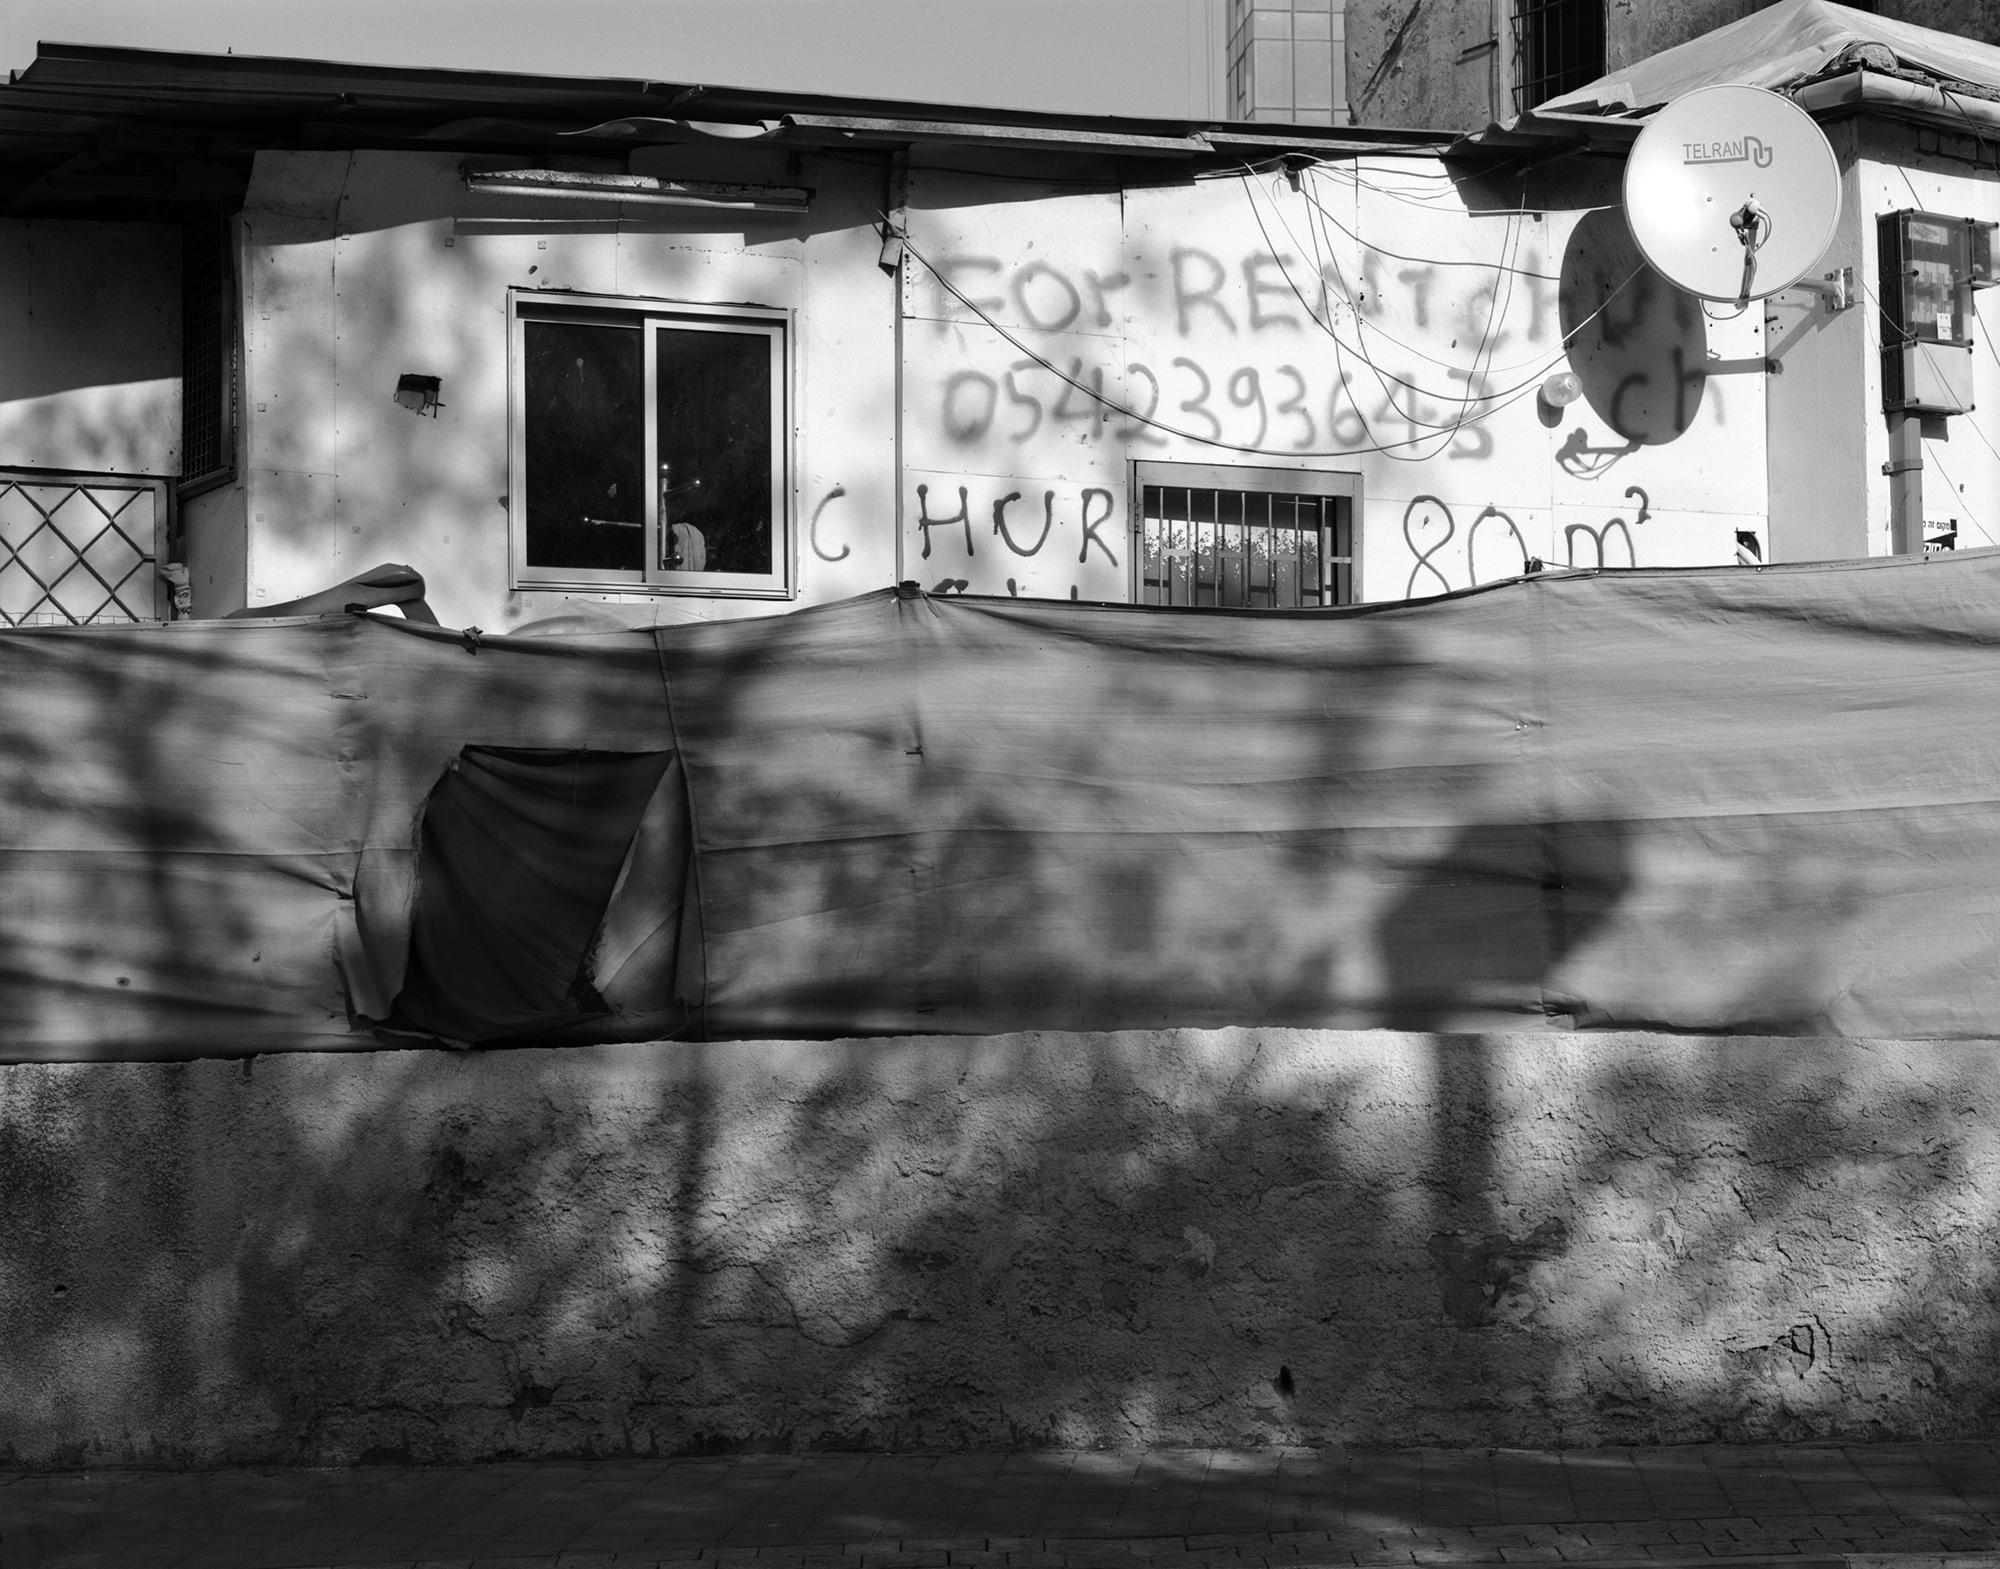 Church, Hagra Street. Neve Sha'anan, 2014